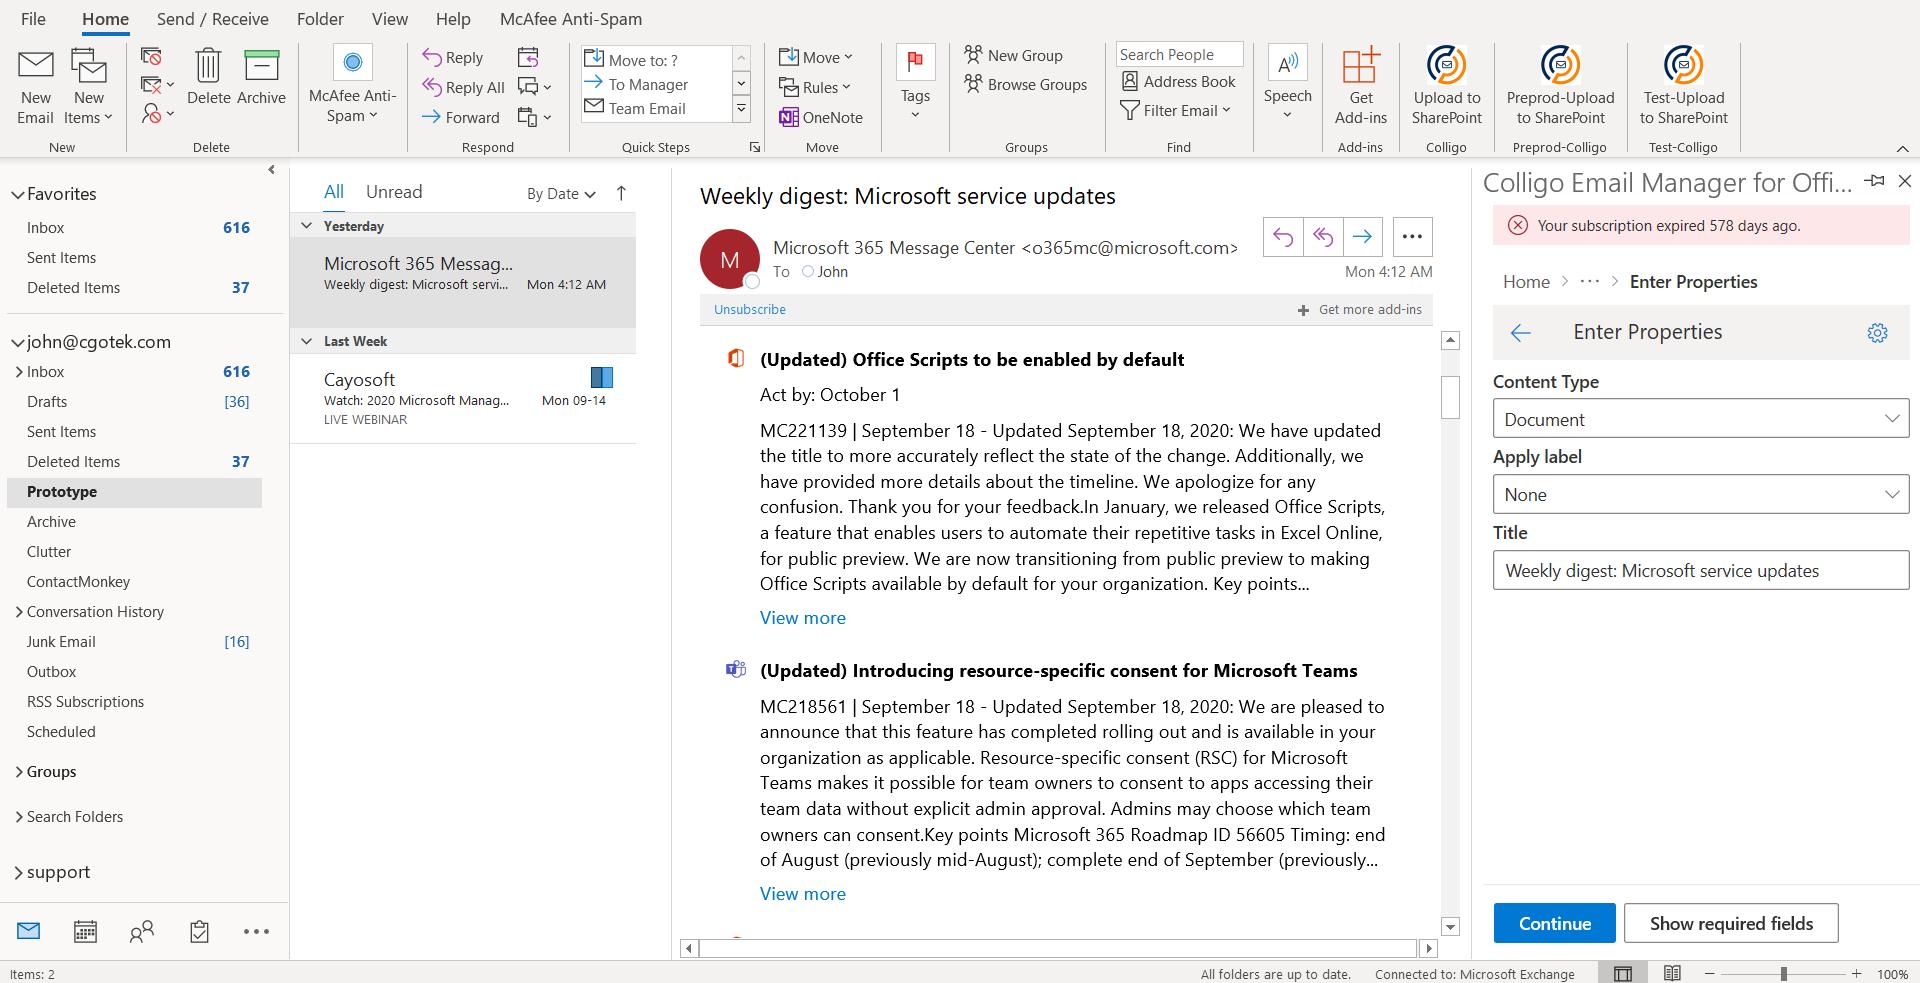 Colligo Email Manager for Microsoft 365 prototype